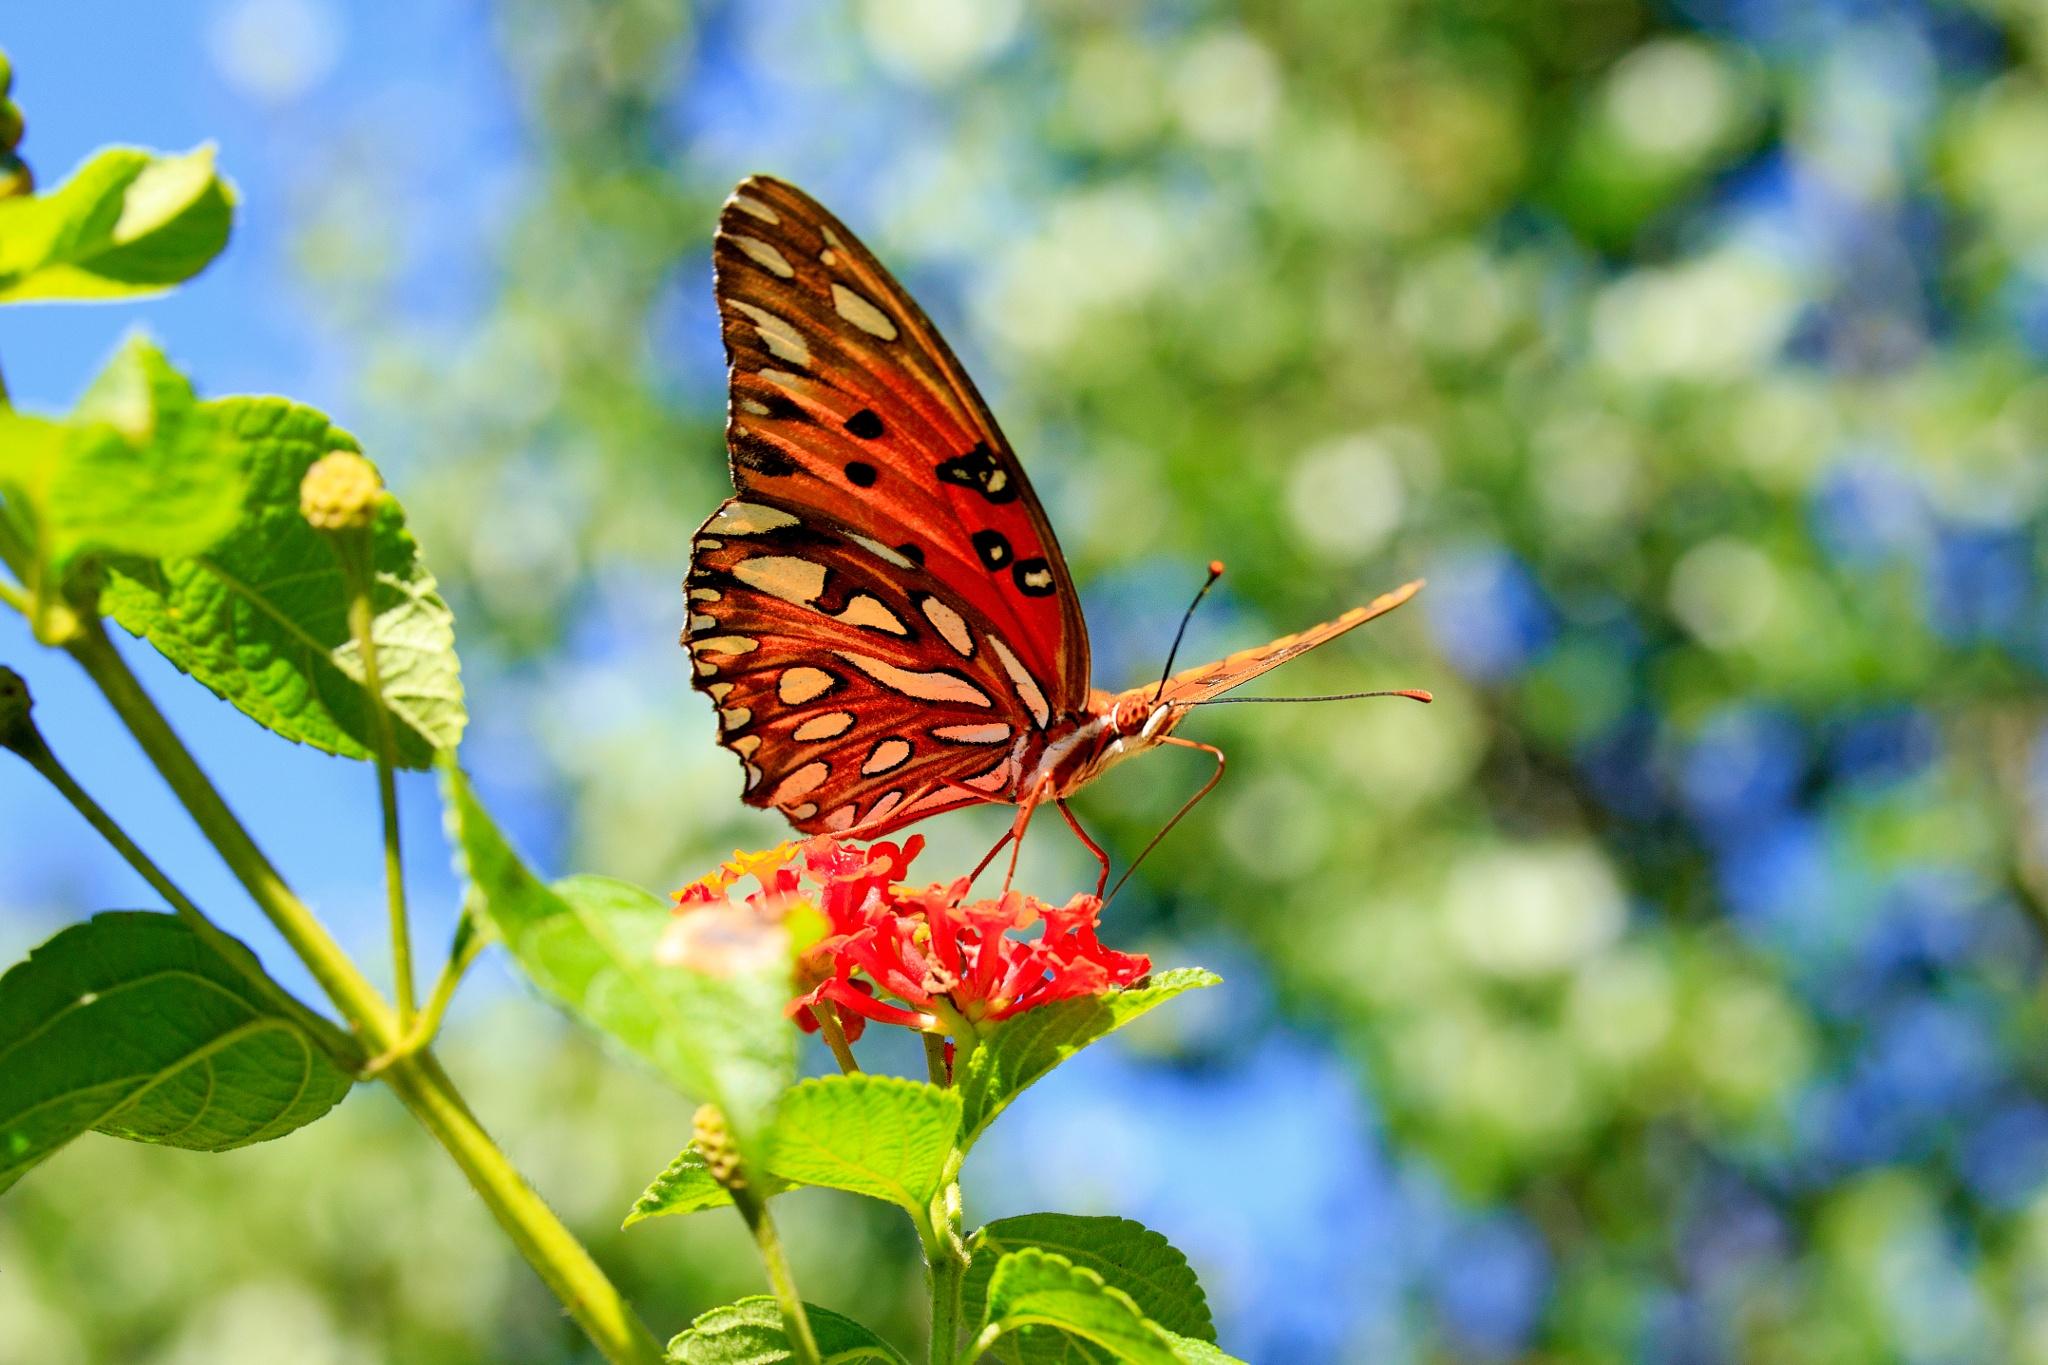 Under a Butterfly by KingRuss